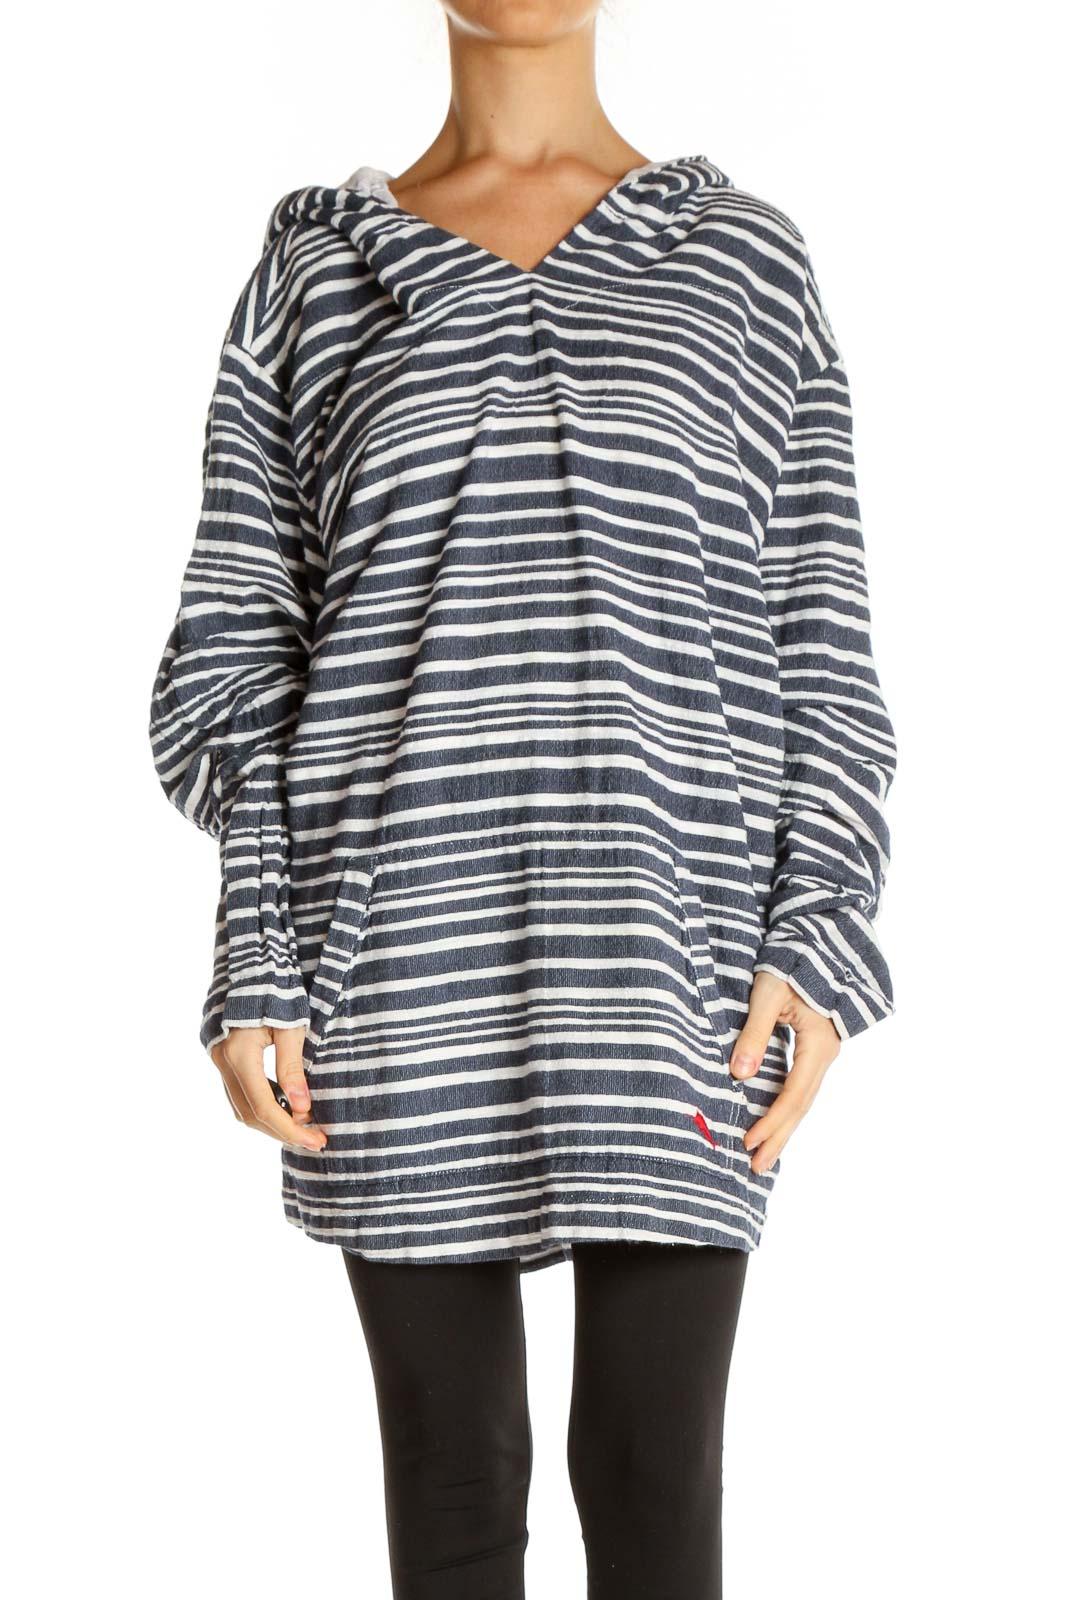 Gray Striped Retro Shirt Front